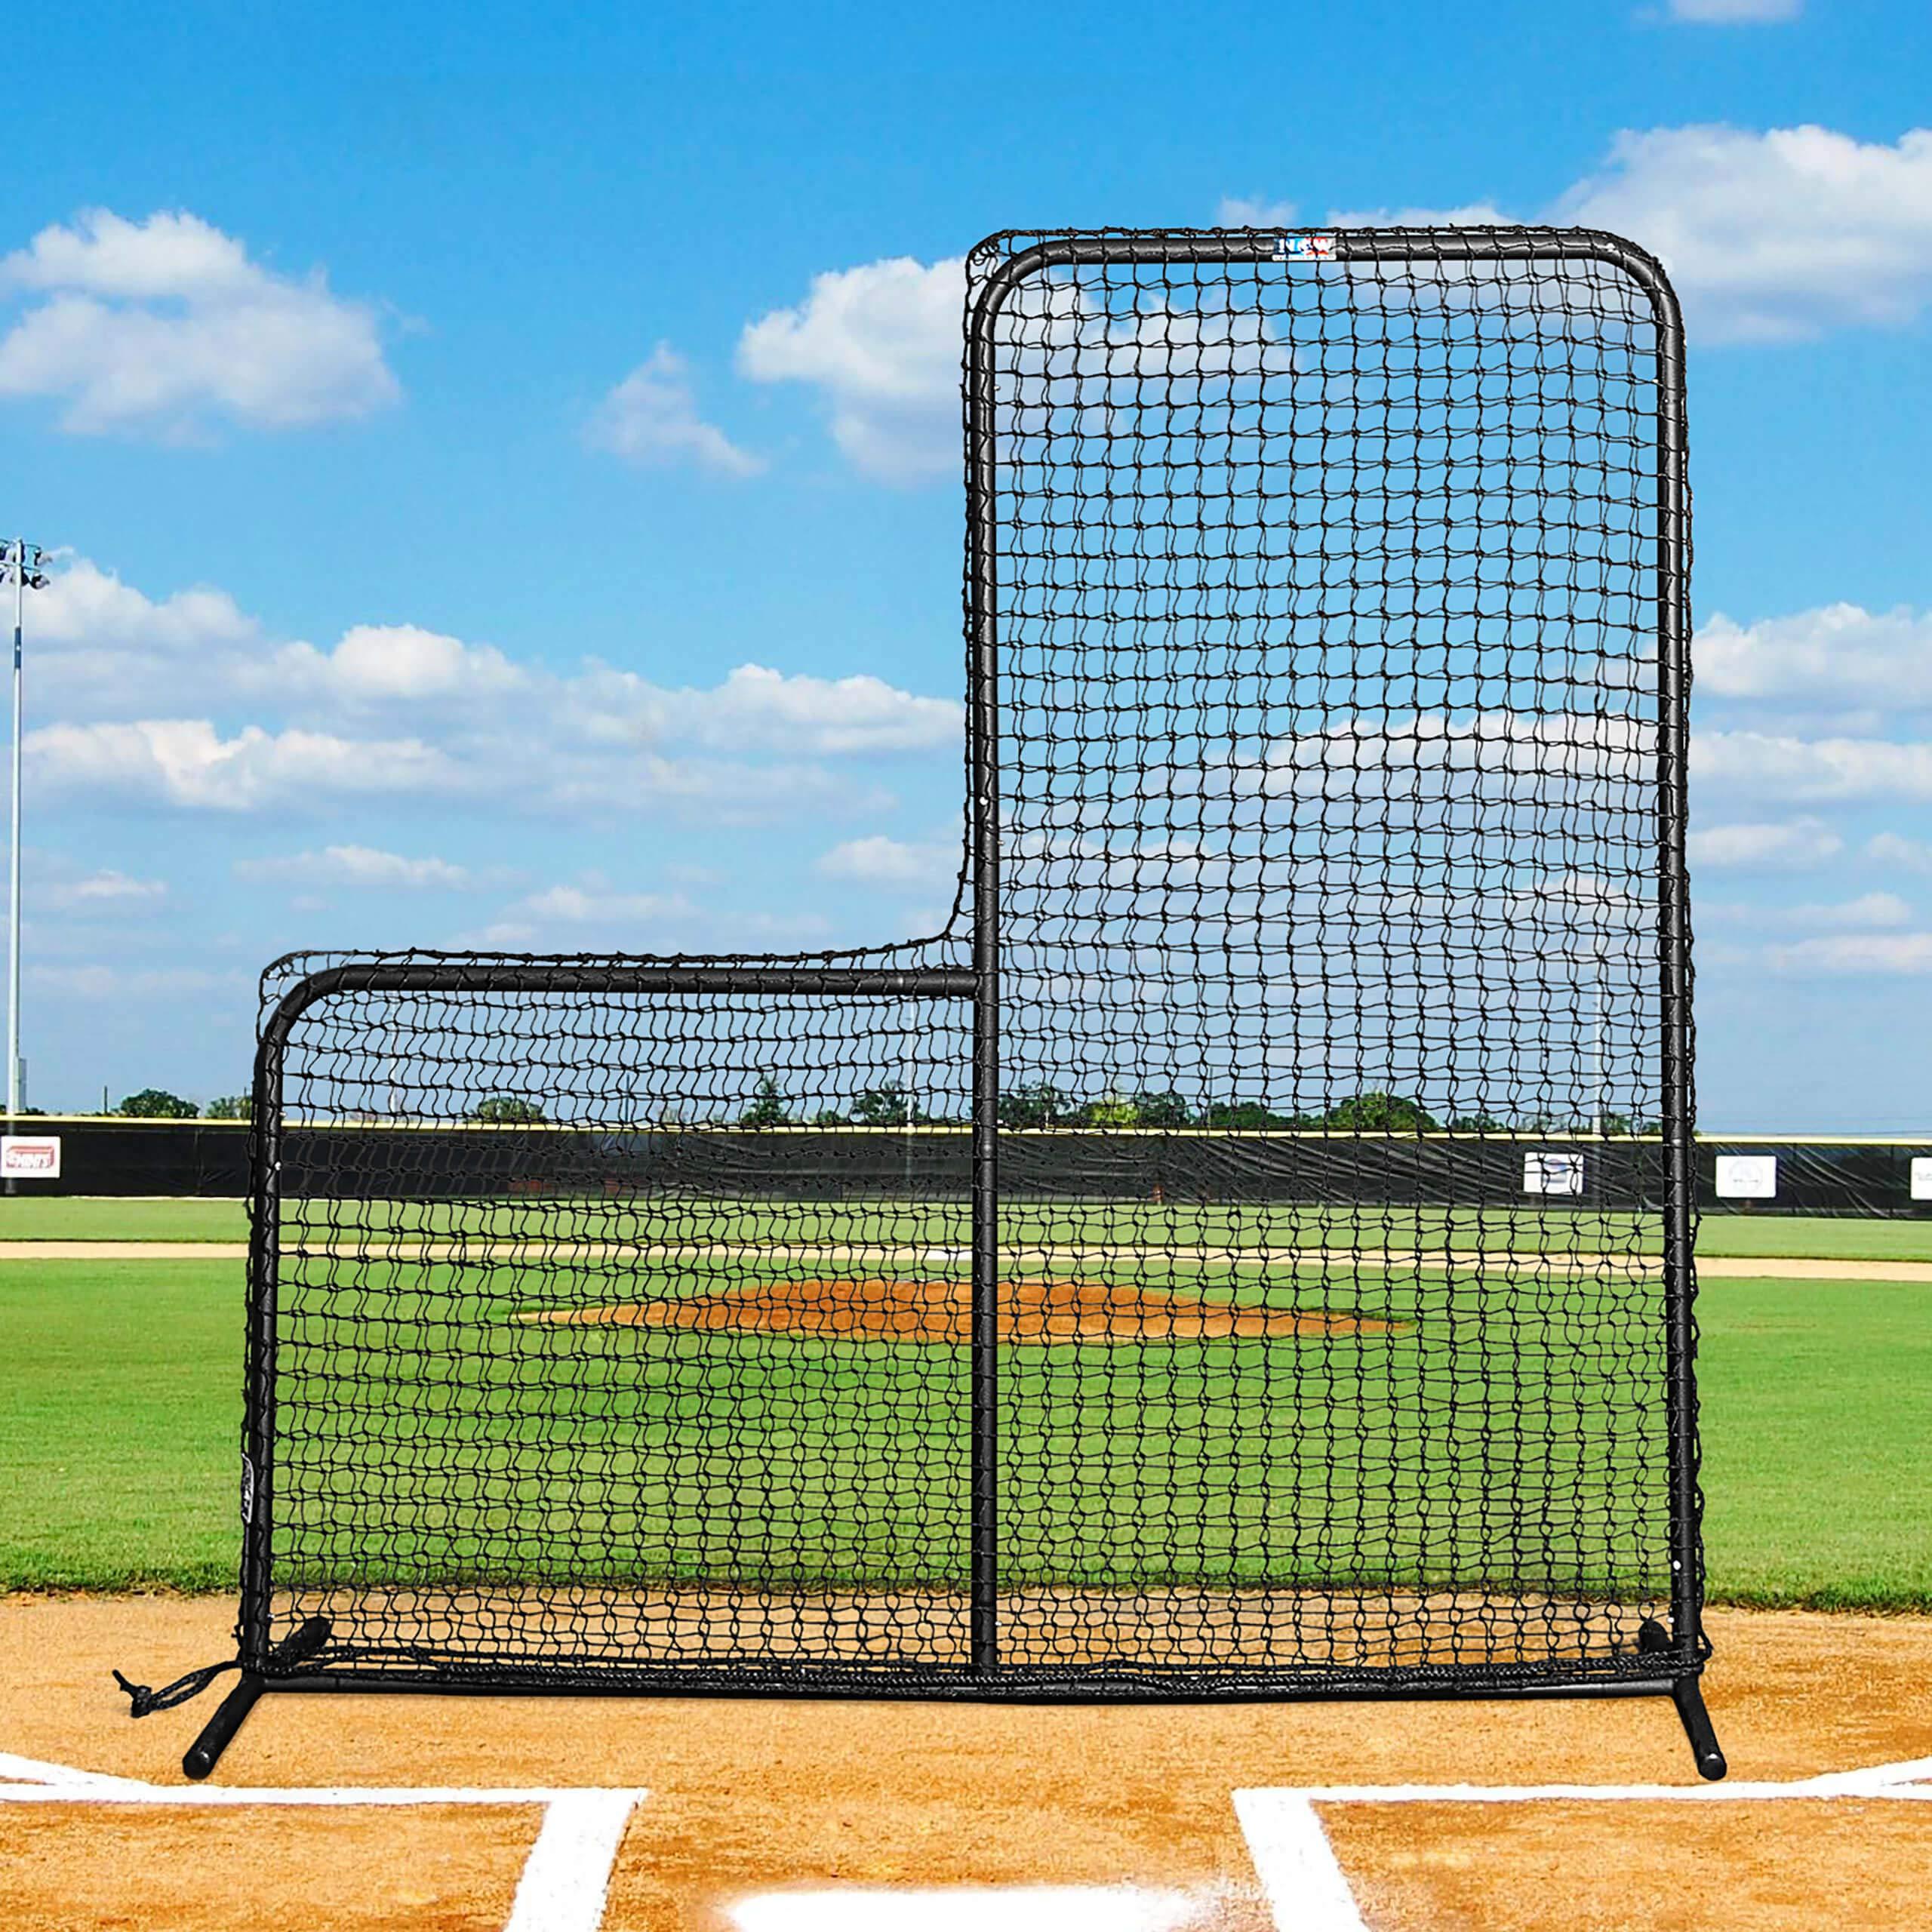 FORTRESS 7' x 7' Pitcher L-Screen Frame & #42 Heavy Duty Net with 42'' Drop by Net World Sports